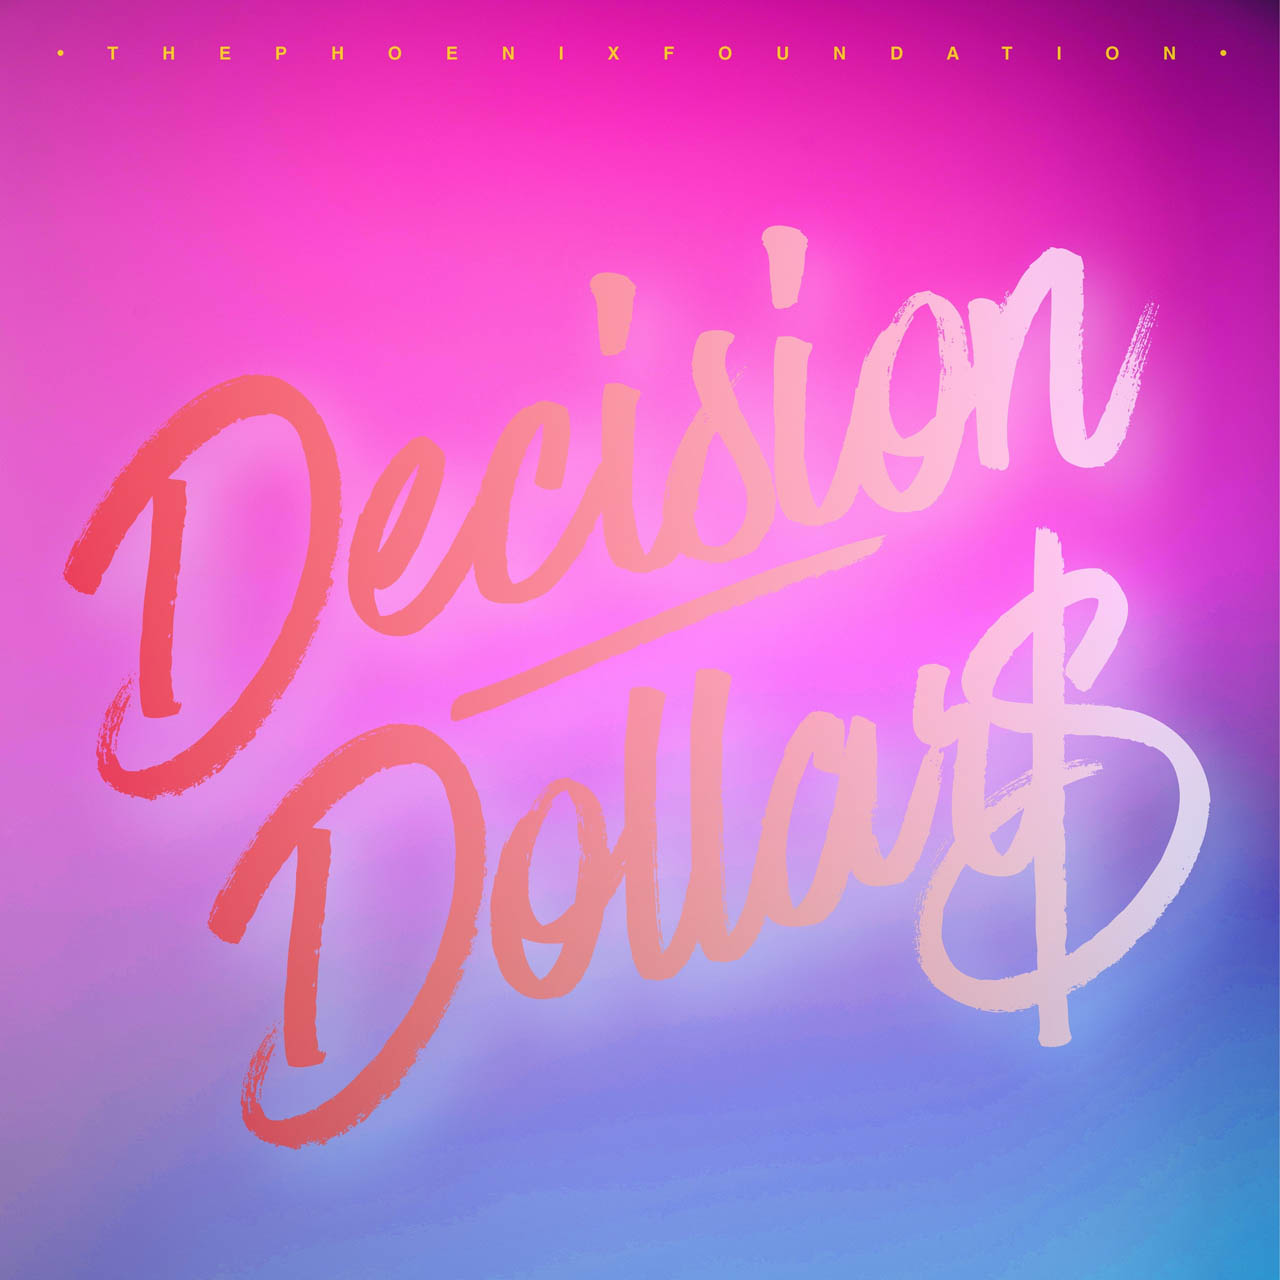 Decision Dollars - The Phoenix Foundation